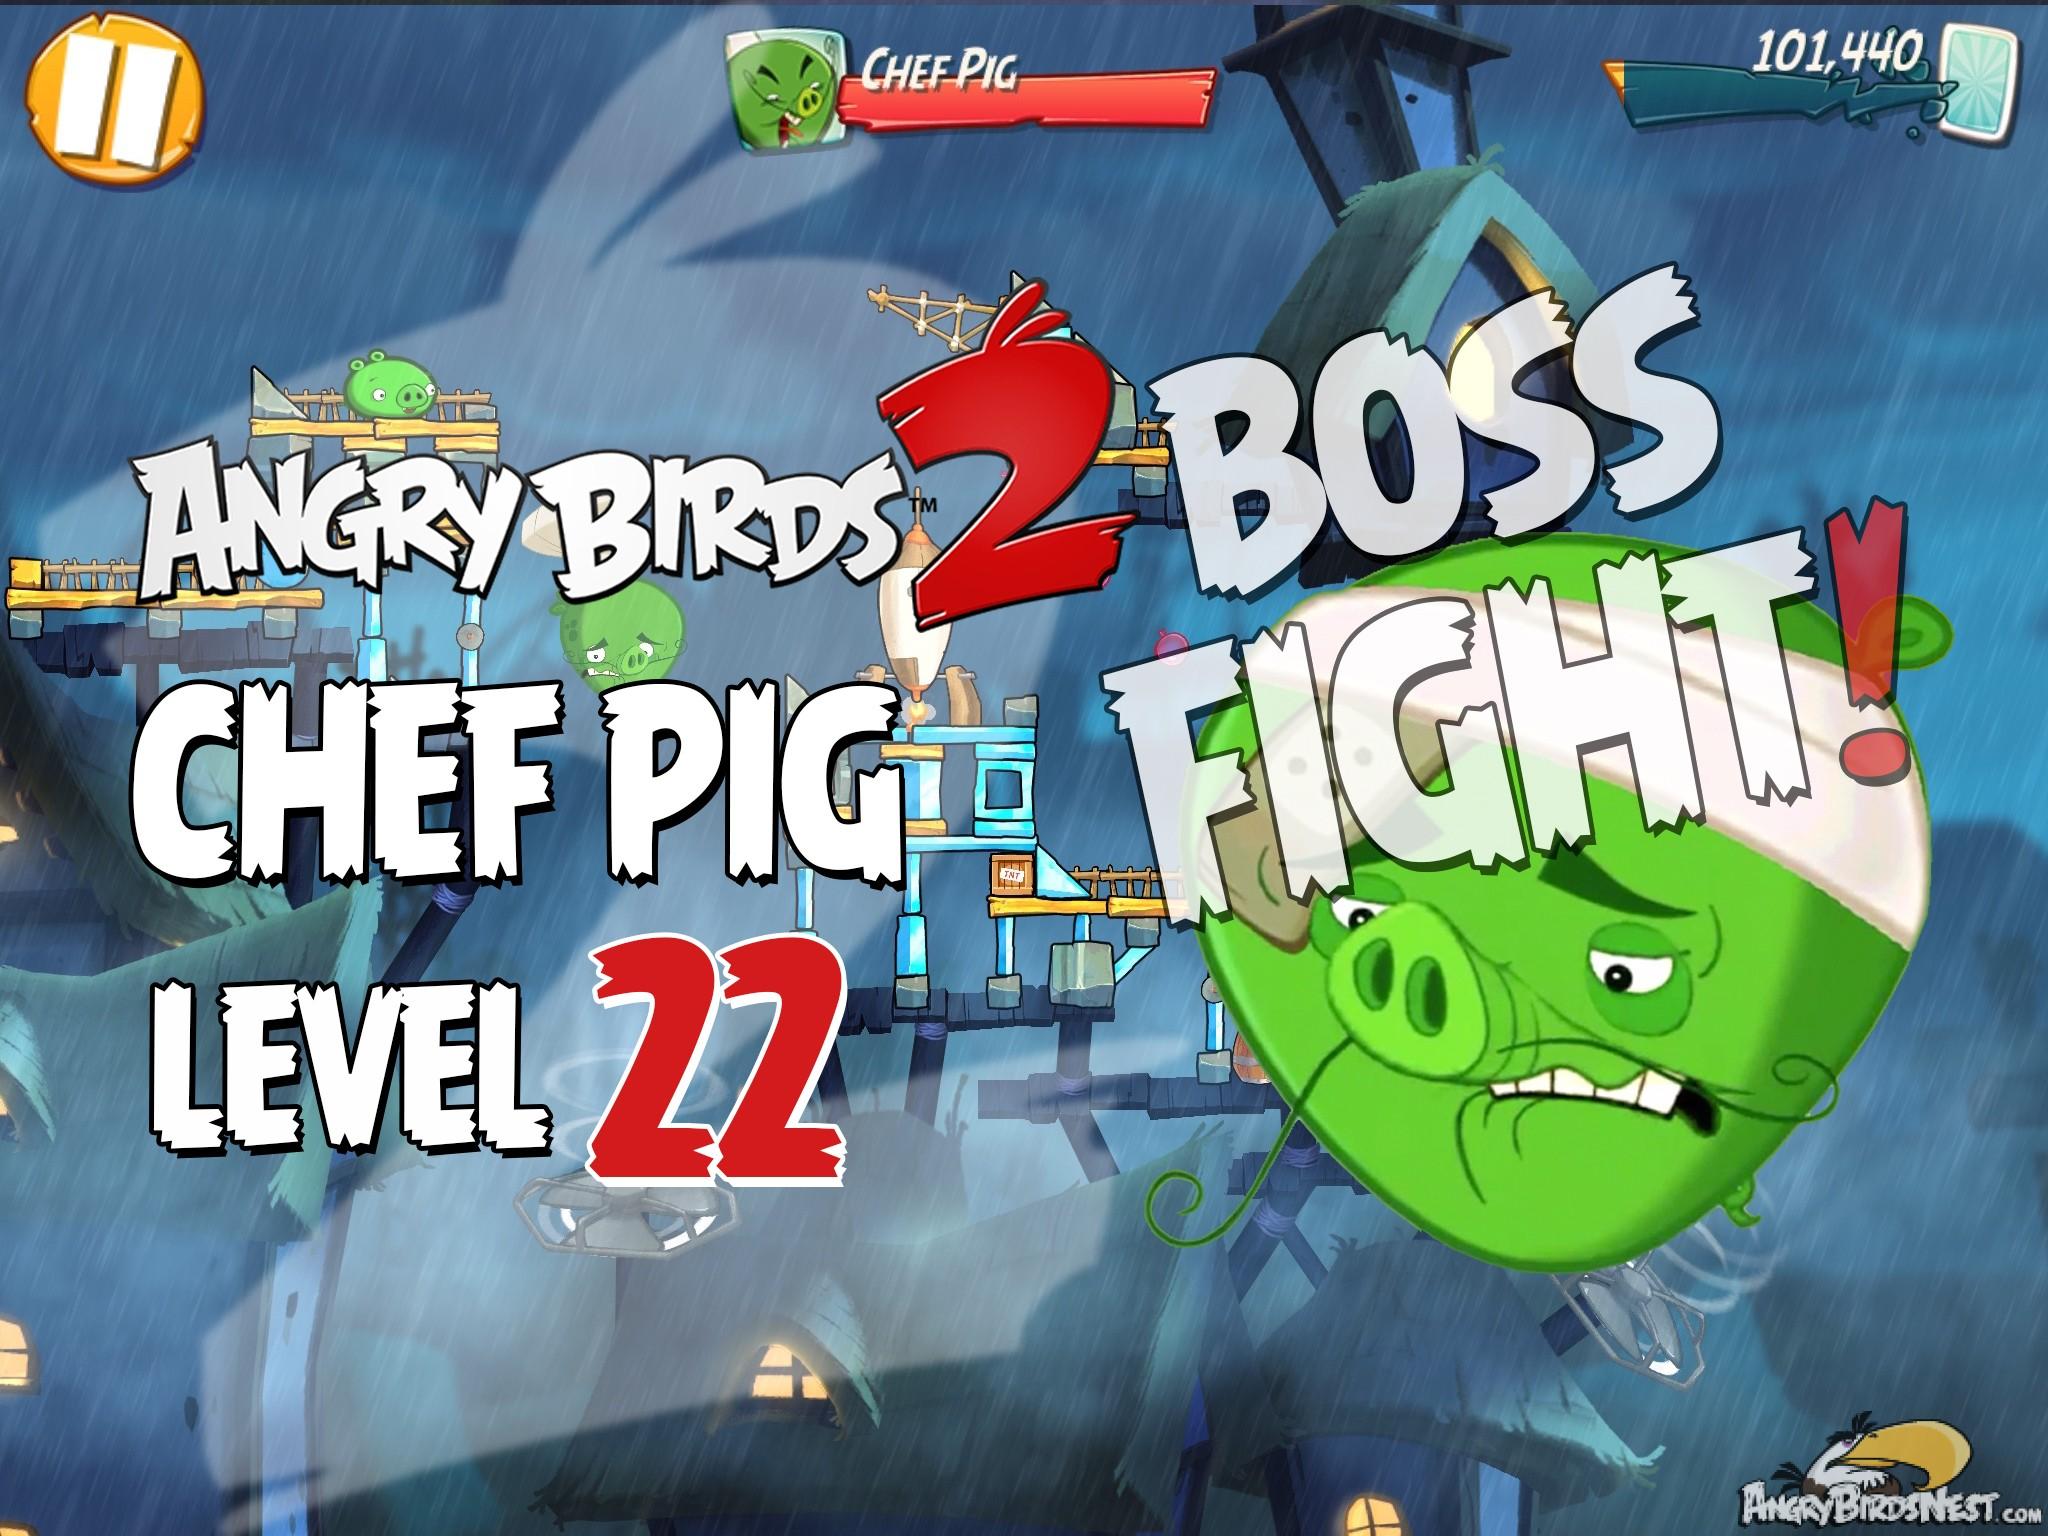 Angry Birds 2 Chef Pig Level 22 Boss Fight Walkthrough